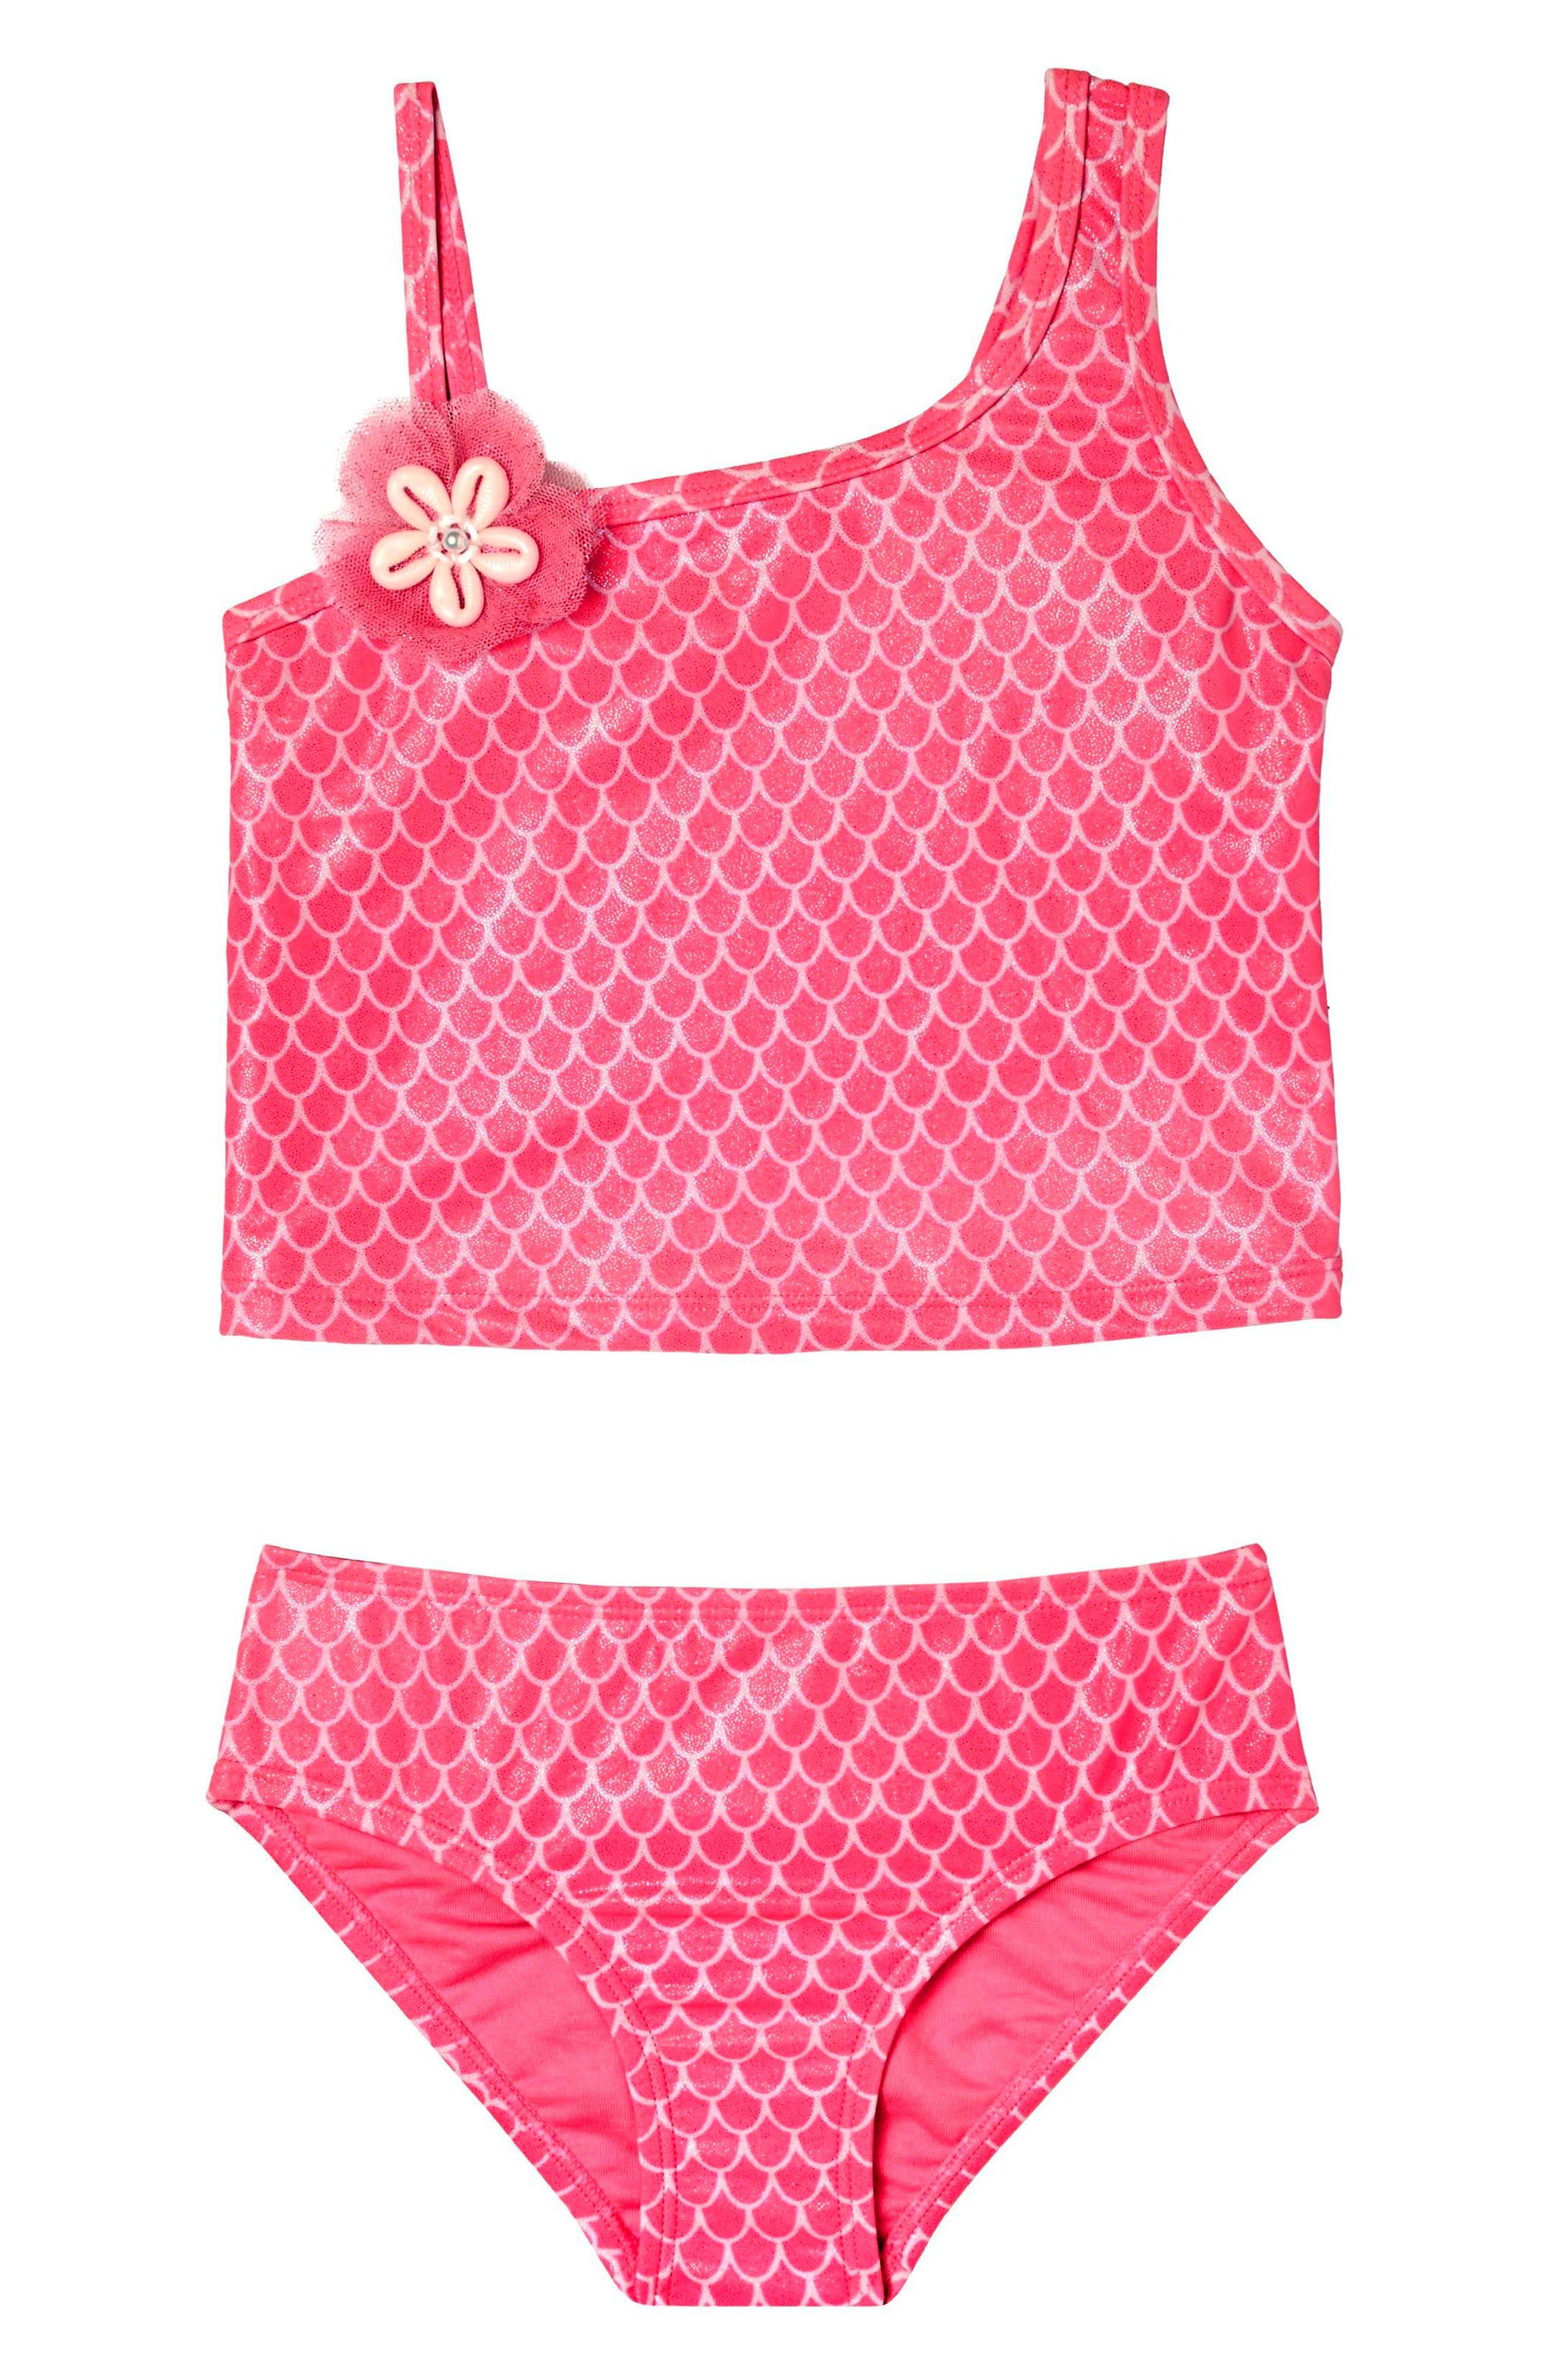 Mermaid Princess Two-Piece Tankini Swimsuit,                         Main,                         color, Pink